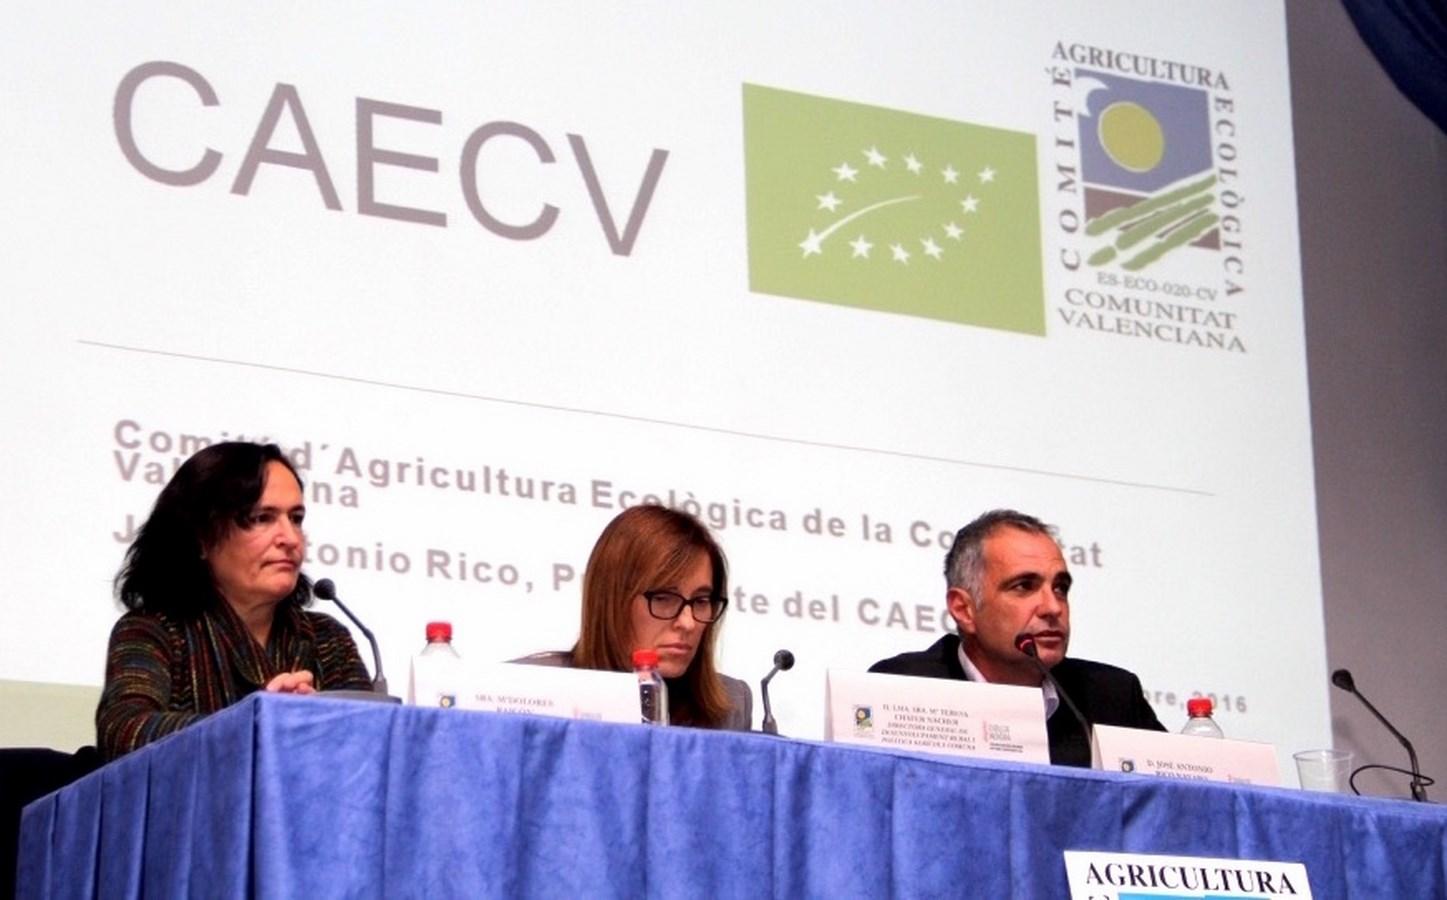 Maite Cháfer, Dolores Raigón, José Antonio Rico